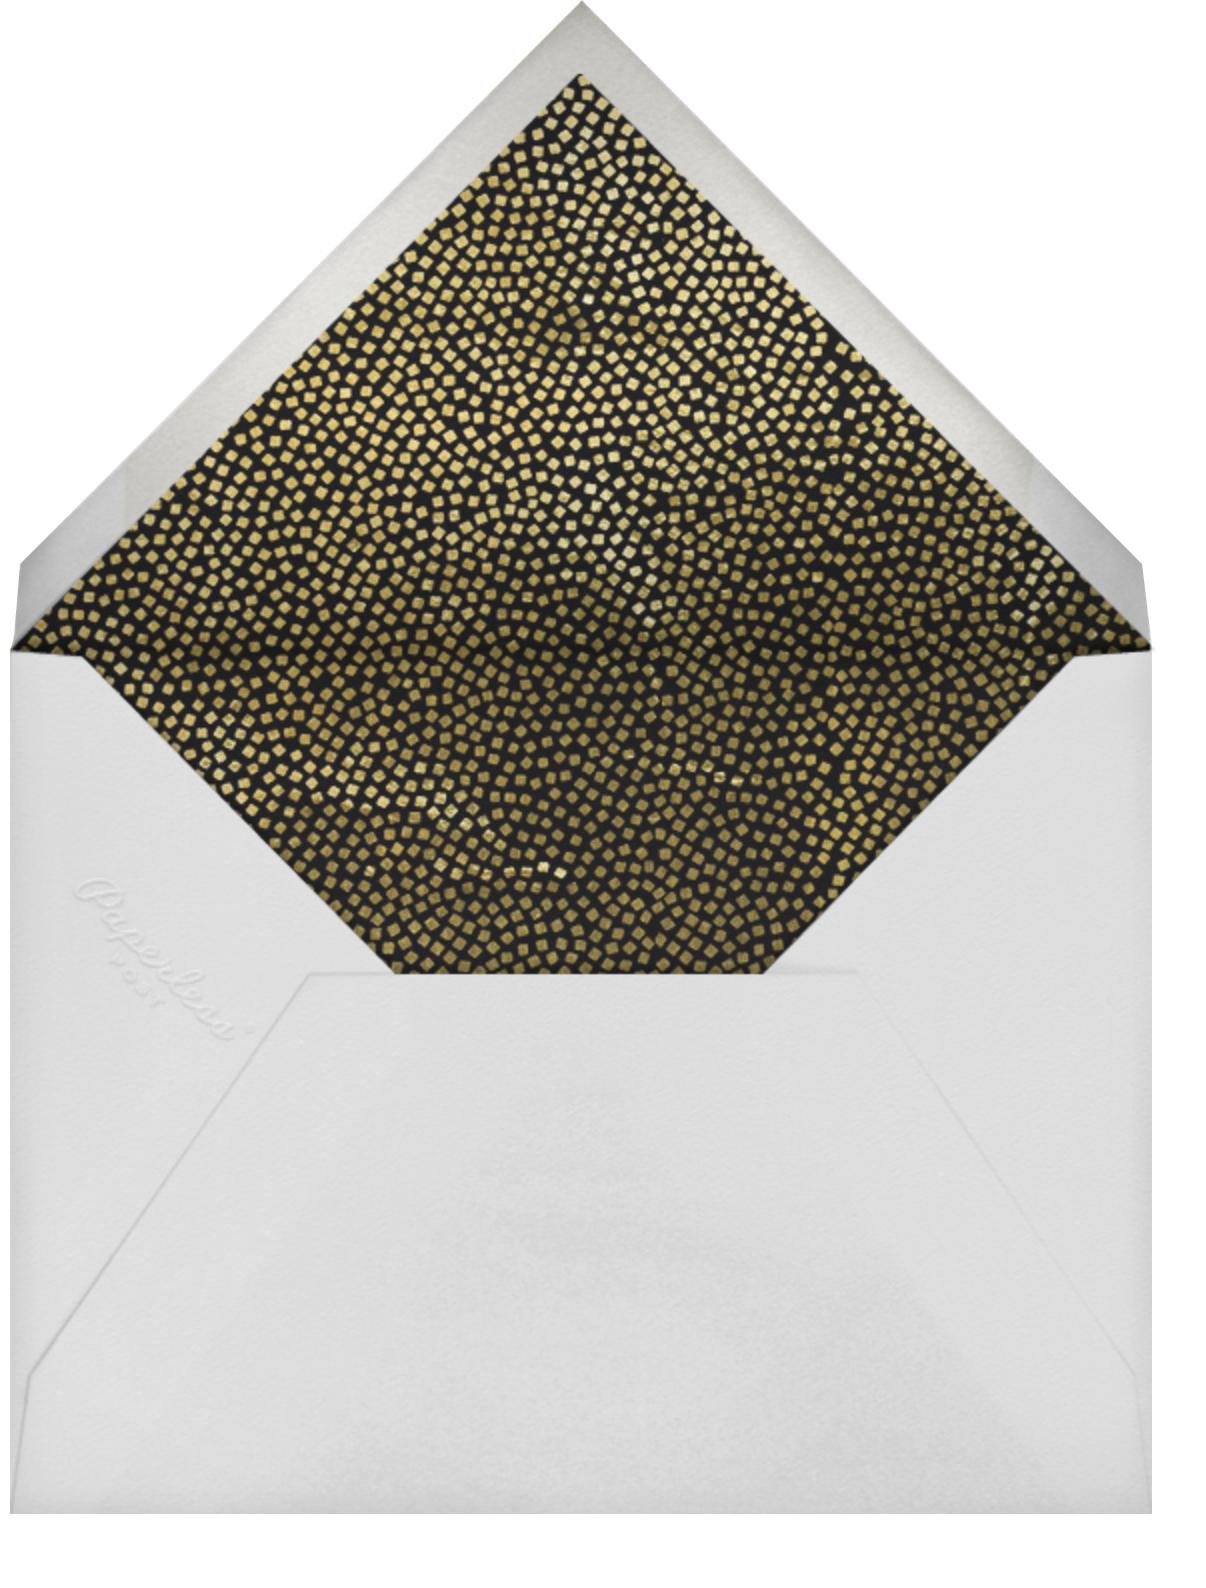 Konfetti (Photo) - Gold - Kelly Wearstler - Wedding - envelope back